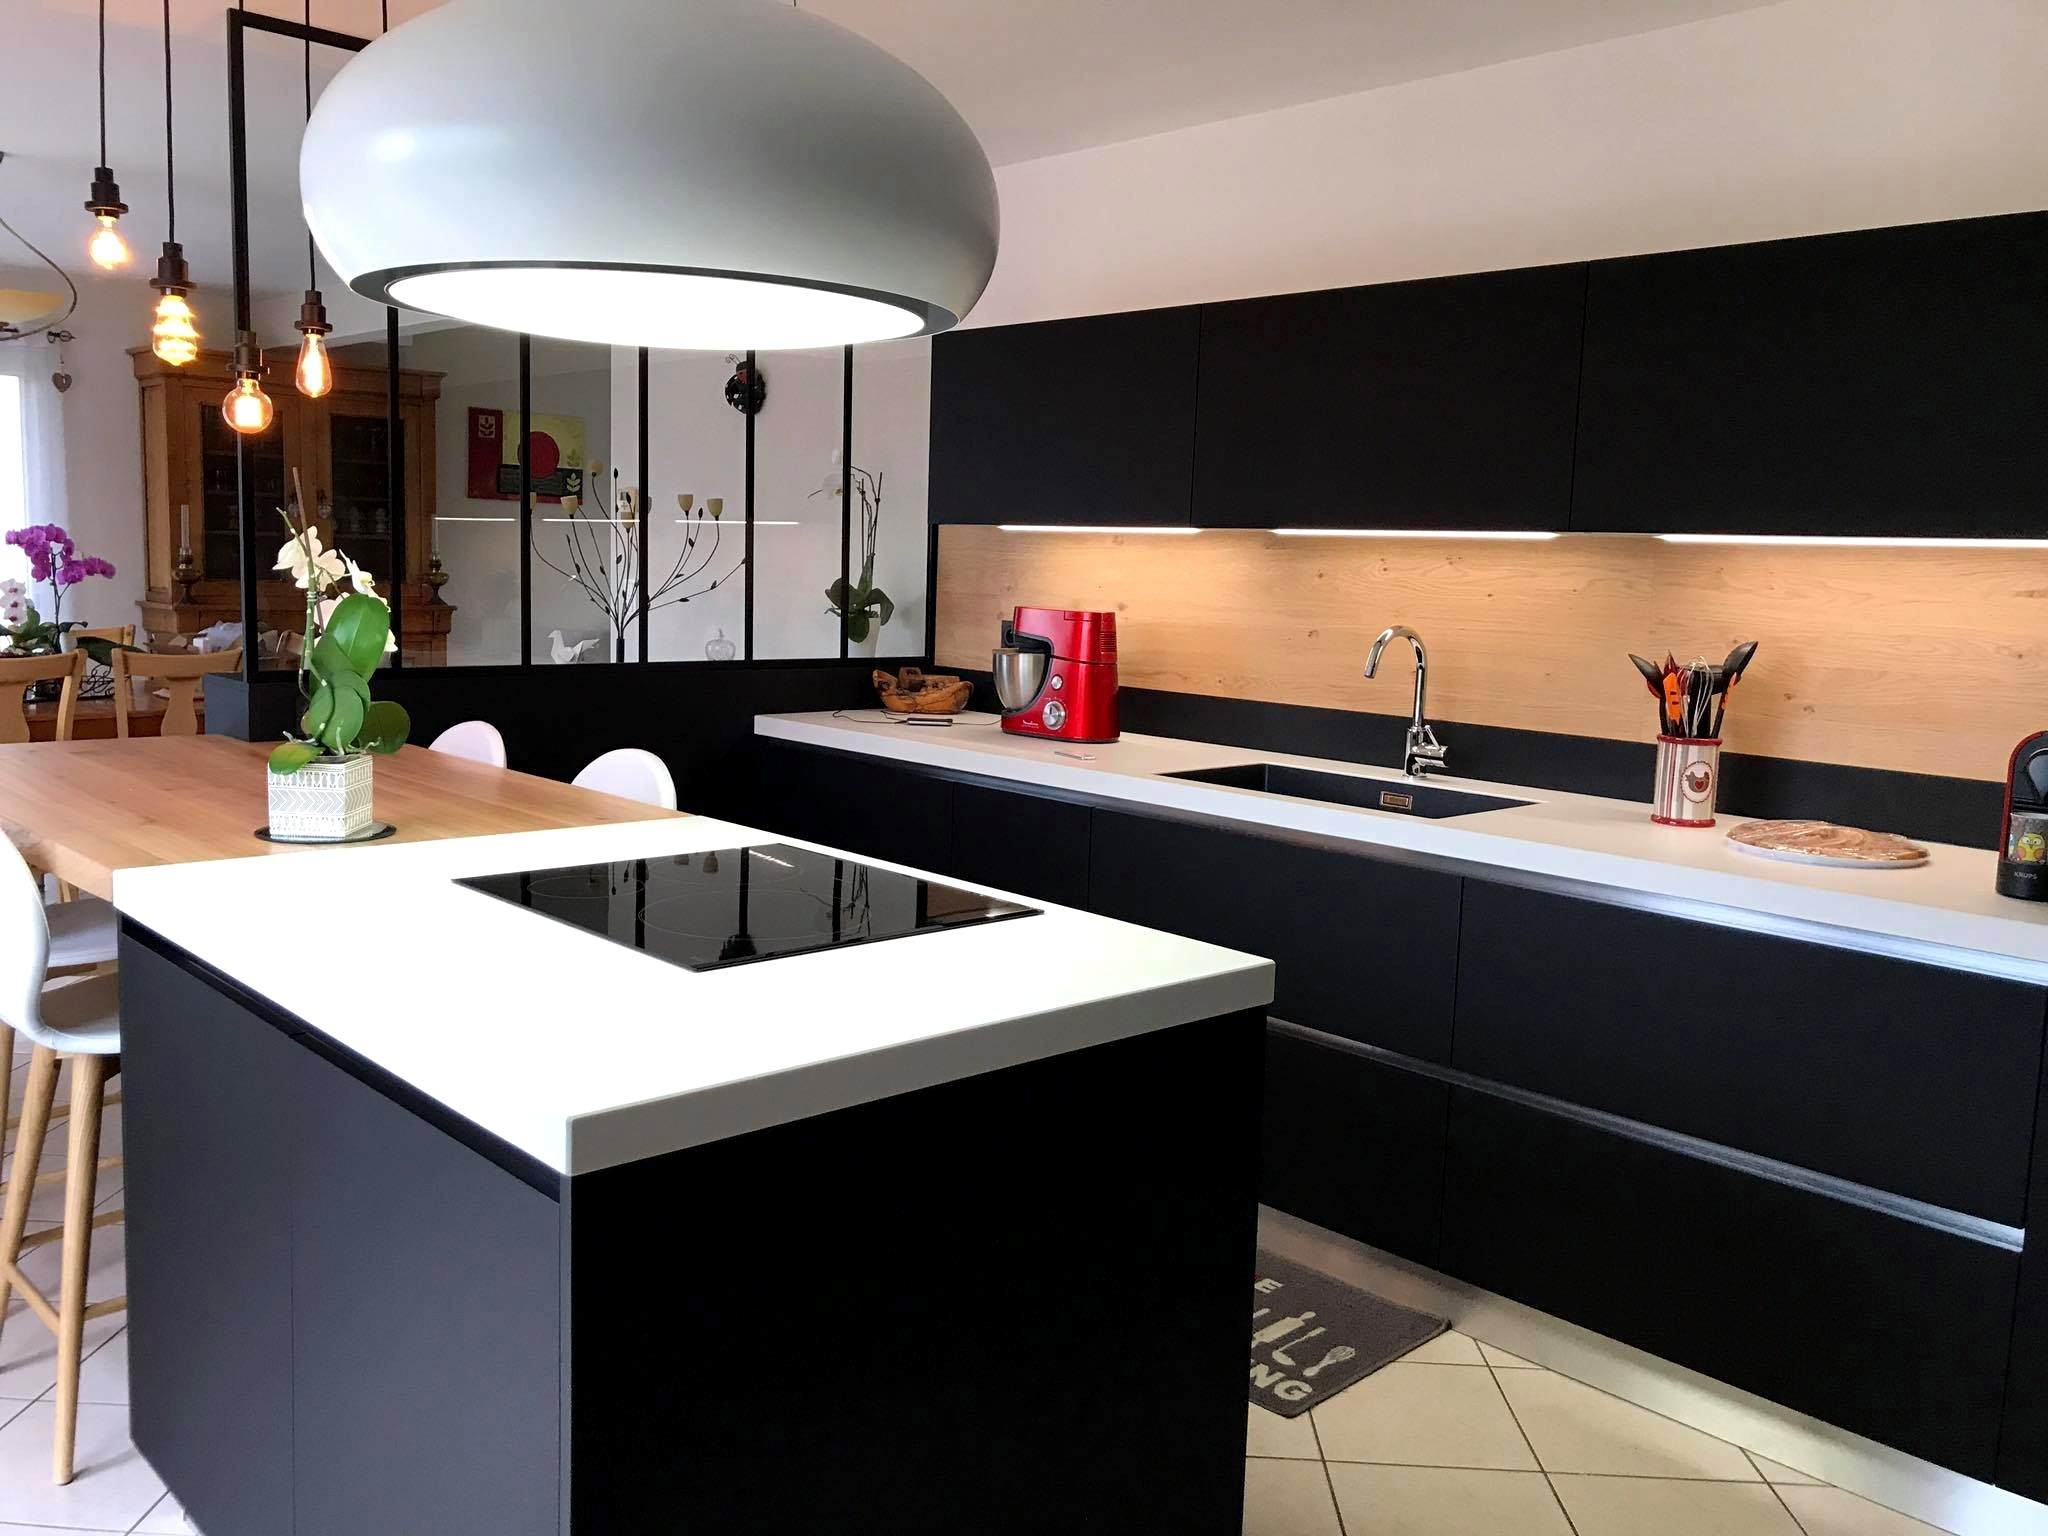 Cuisine Moderne Avec Ilot Gallery En 2020 Meuble Cuisine Cuisine Moderne